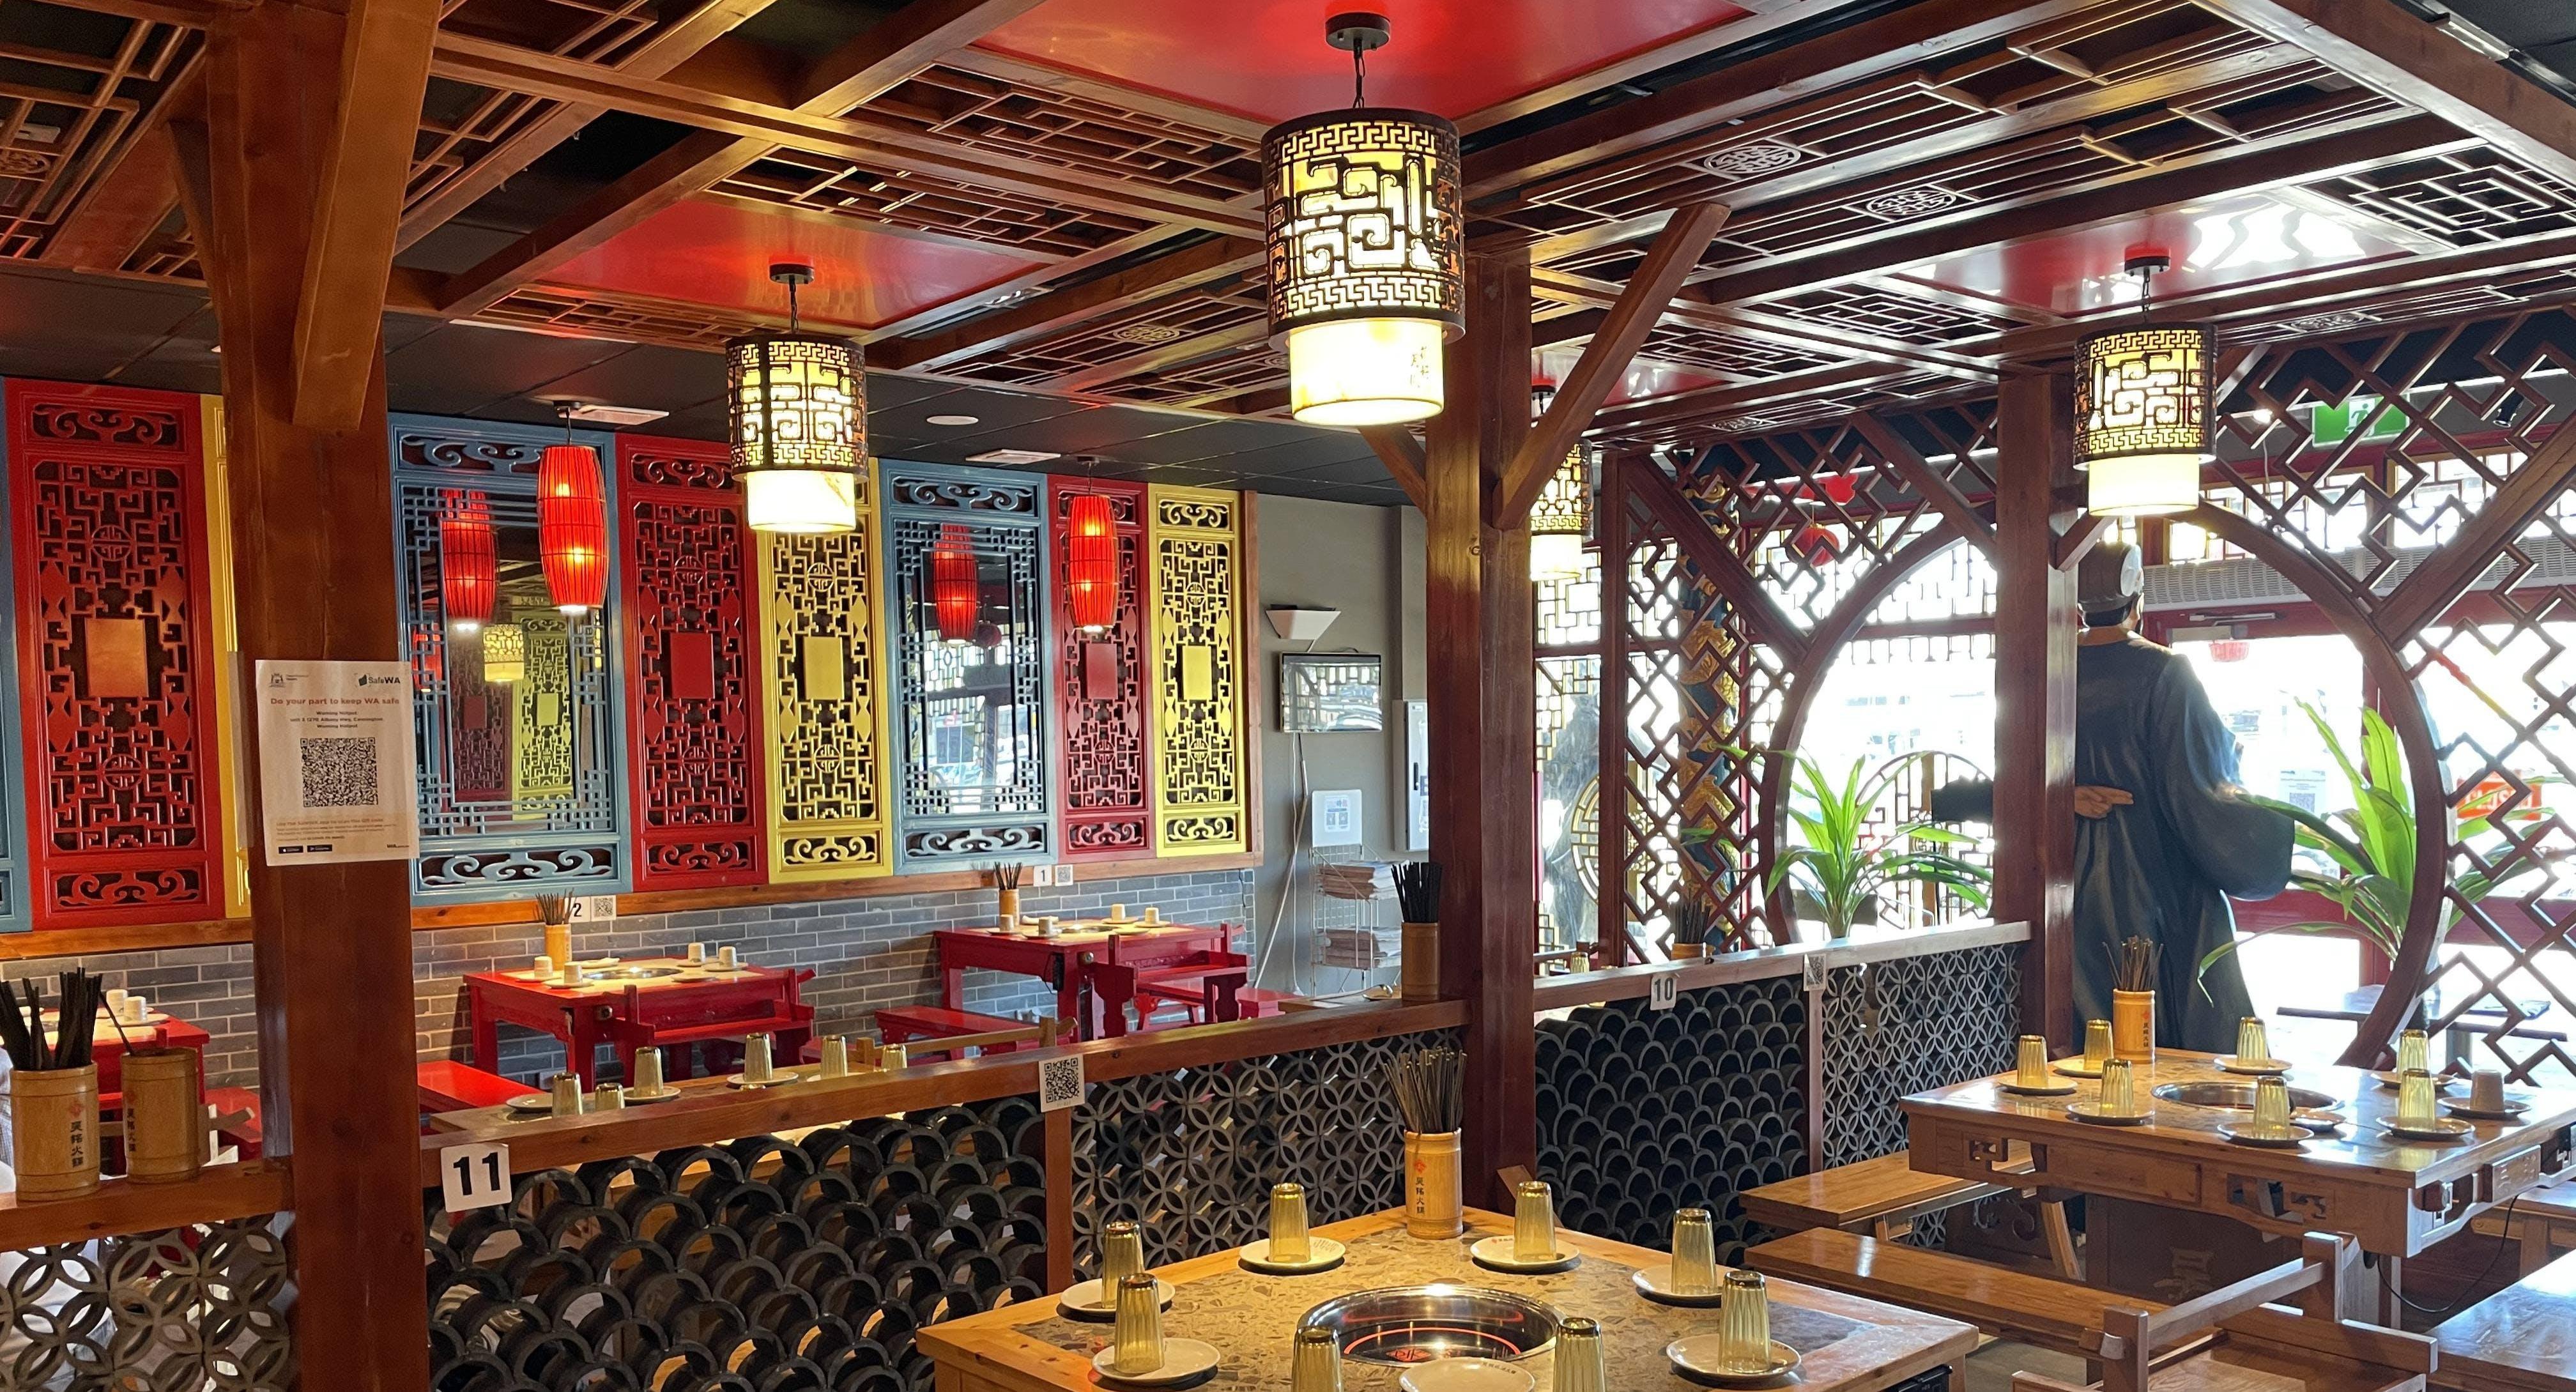 Photo of restaurant Wu Ming Hot Pot 吴铭火锅 - Cannington in Cannington, Perth